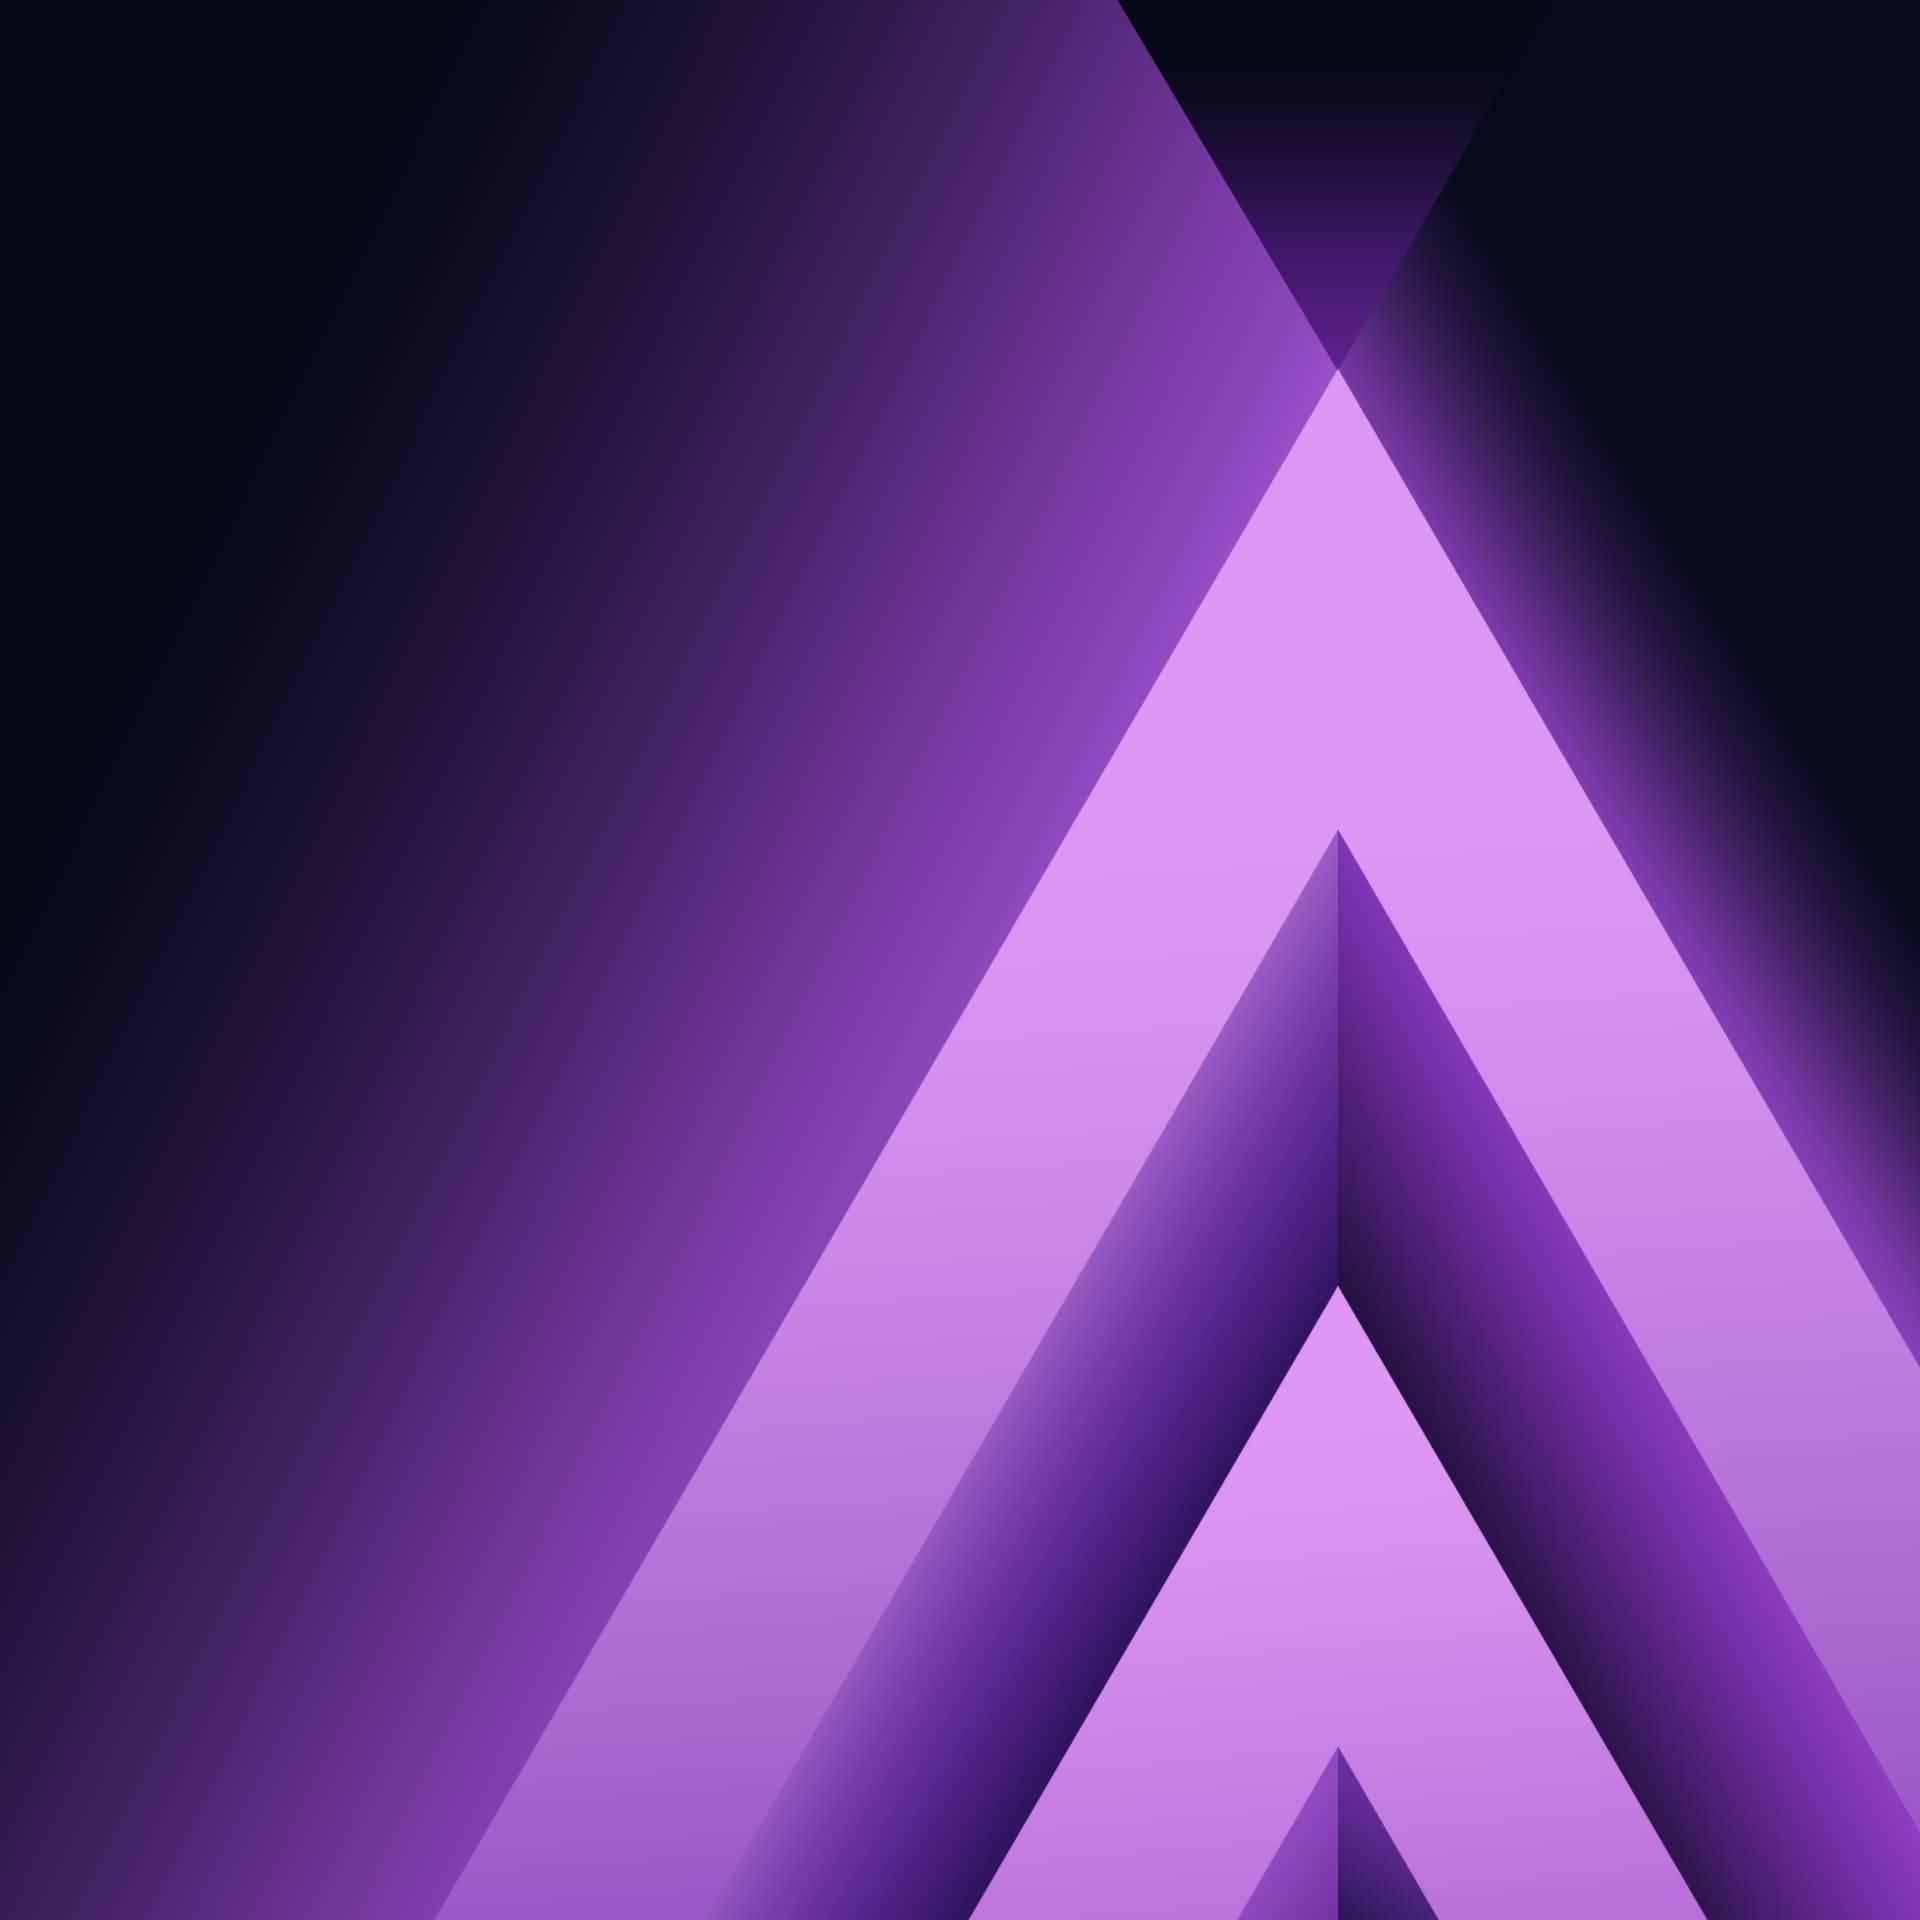 Purple Samsung Galaxy A3 2017 1920x1920 Wallpaper Teahub Io